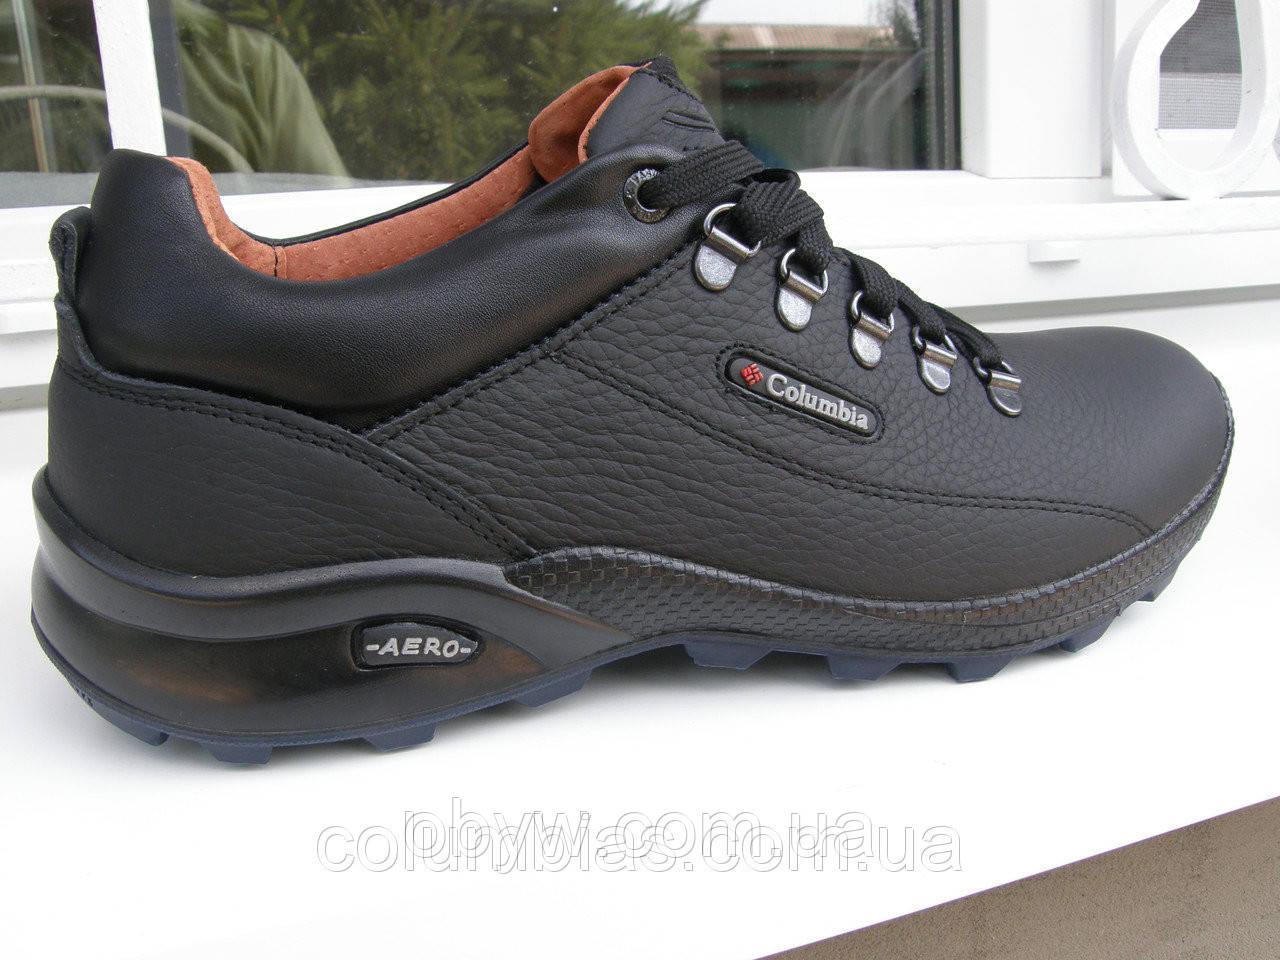 Туфли Calambia  для мужчин в Днепре